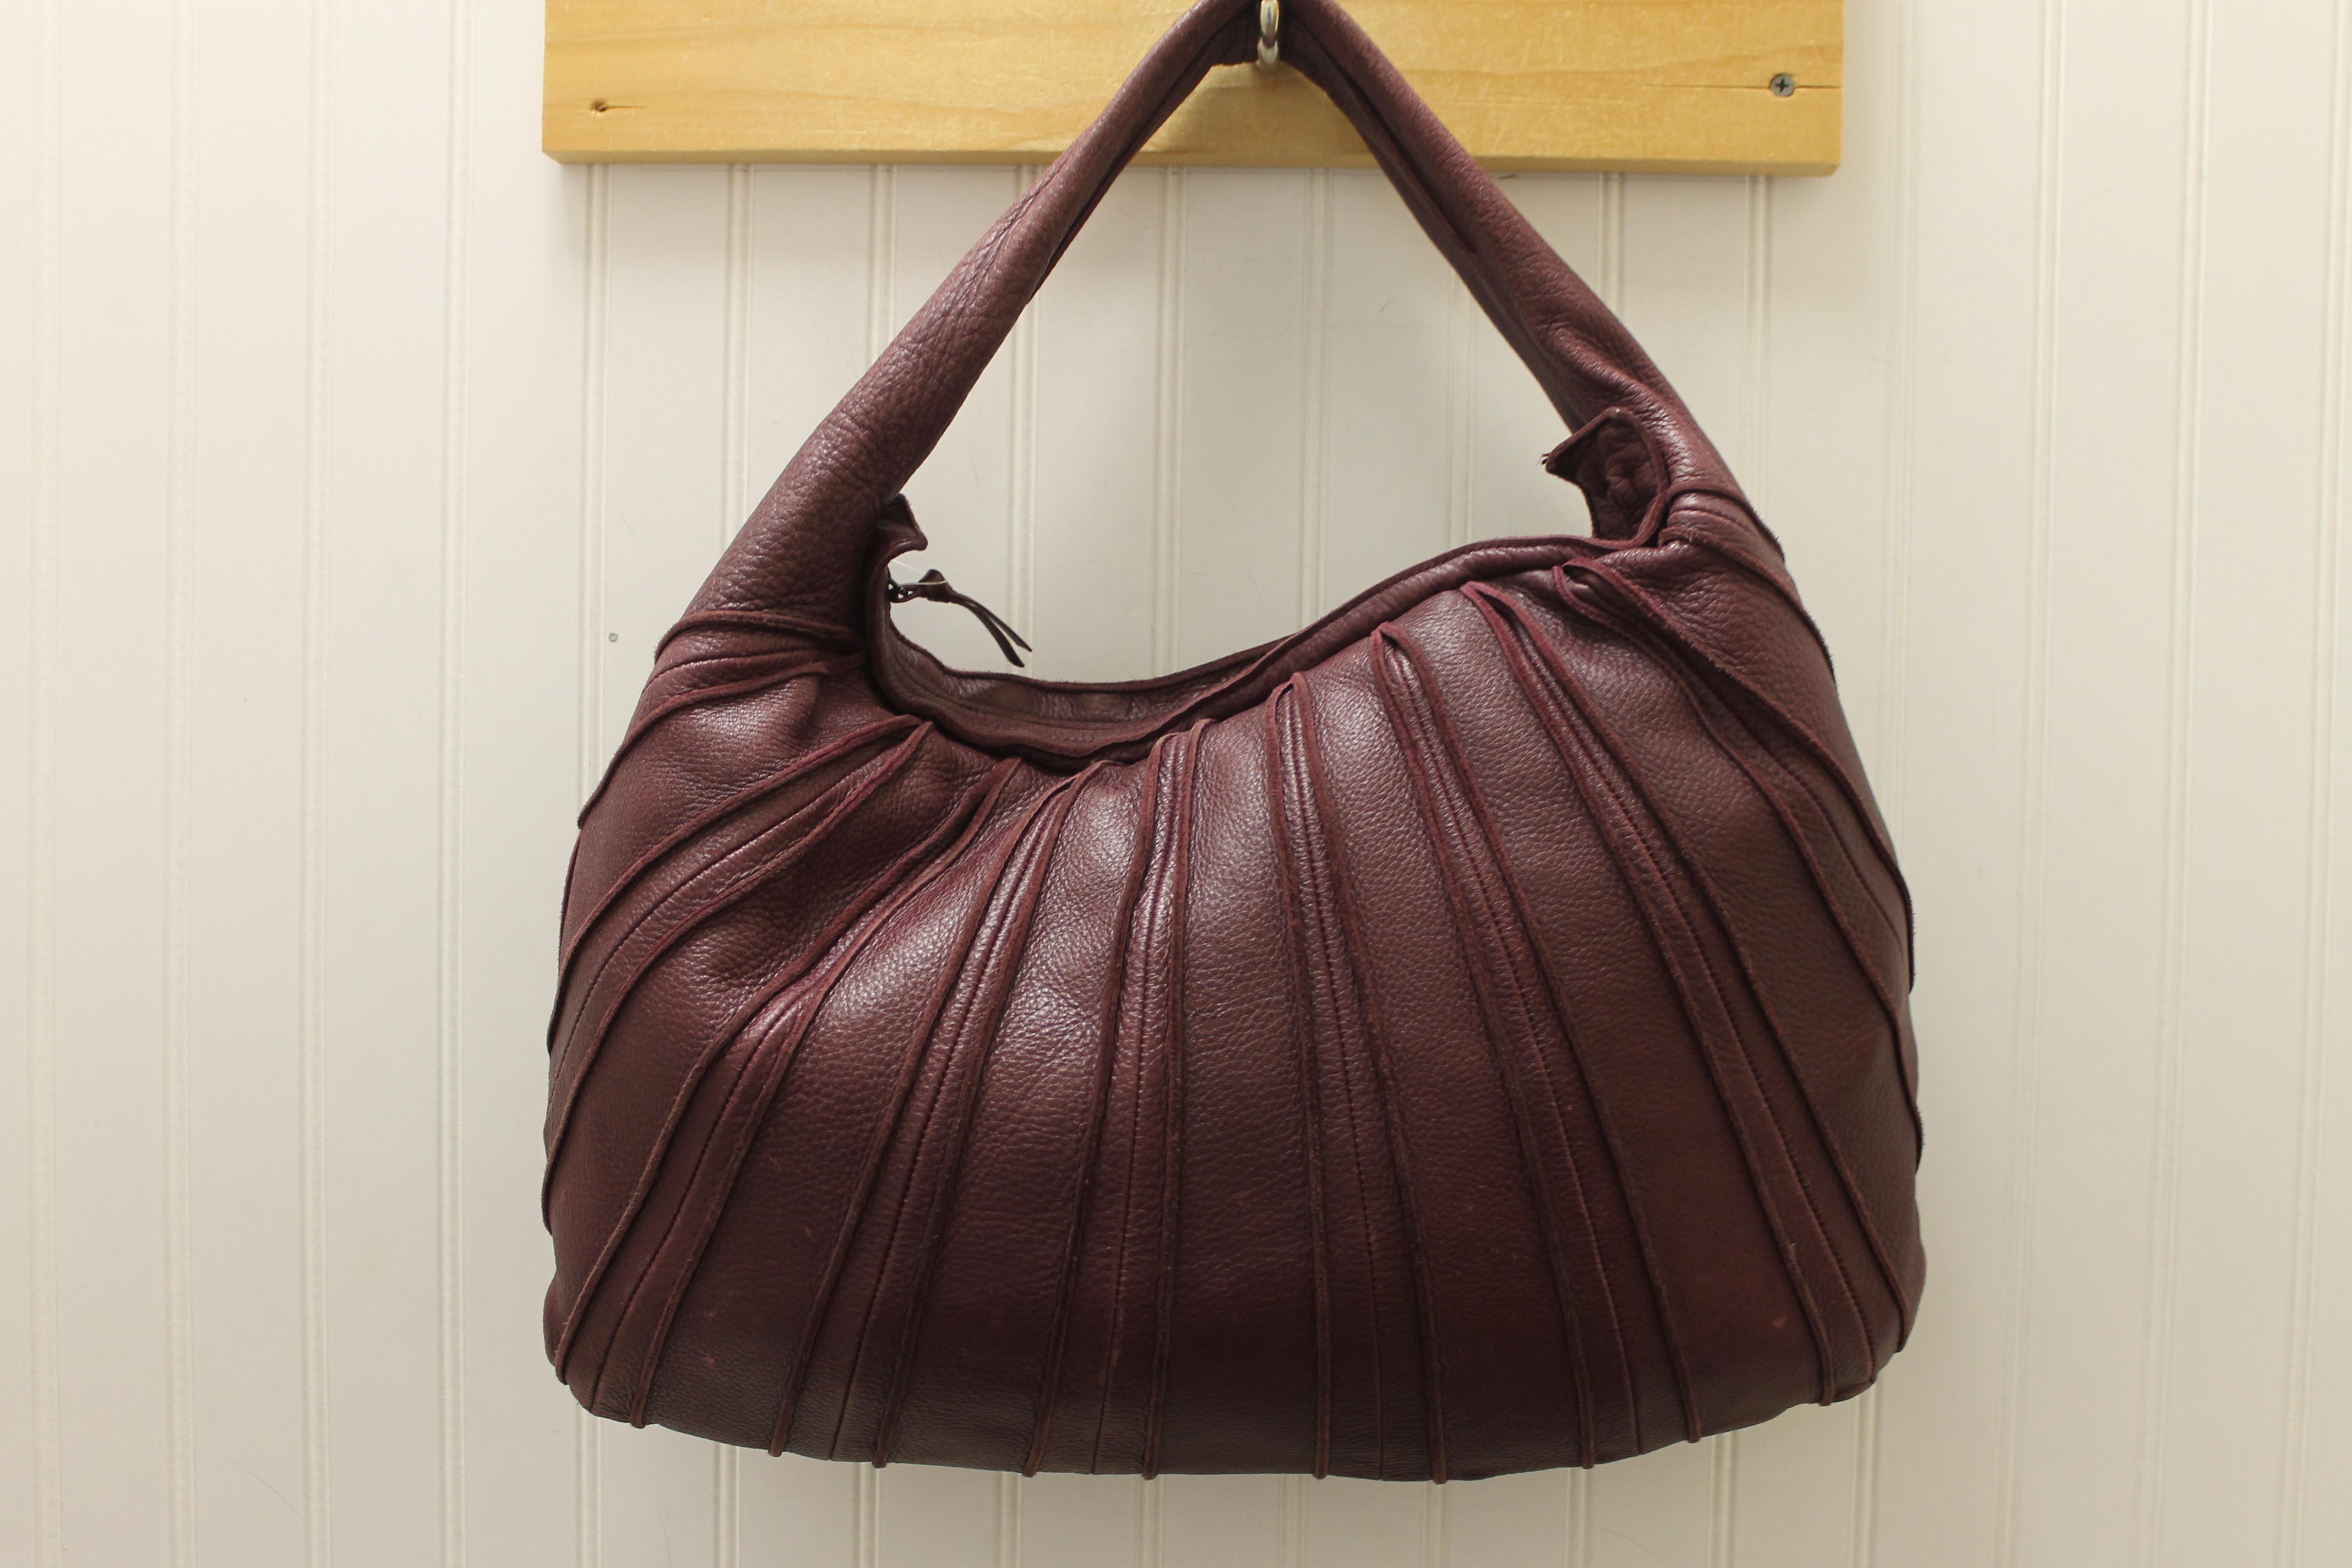 ac9e0e9ac9 BOTTEGA-VENETA-MERLO-Leather-Solid-SHOULDER-BAG 66537A.jpg